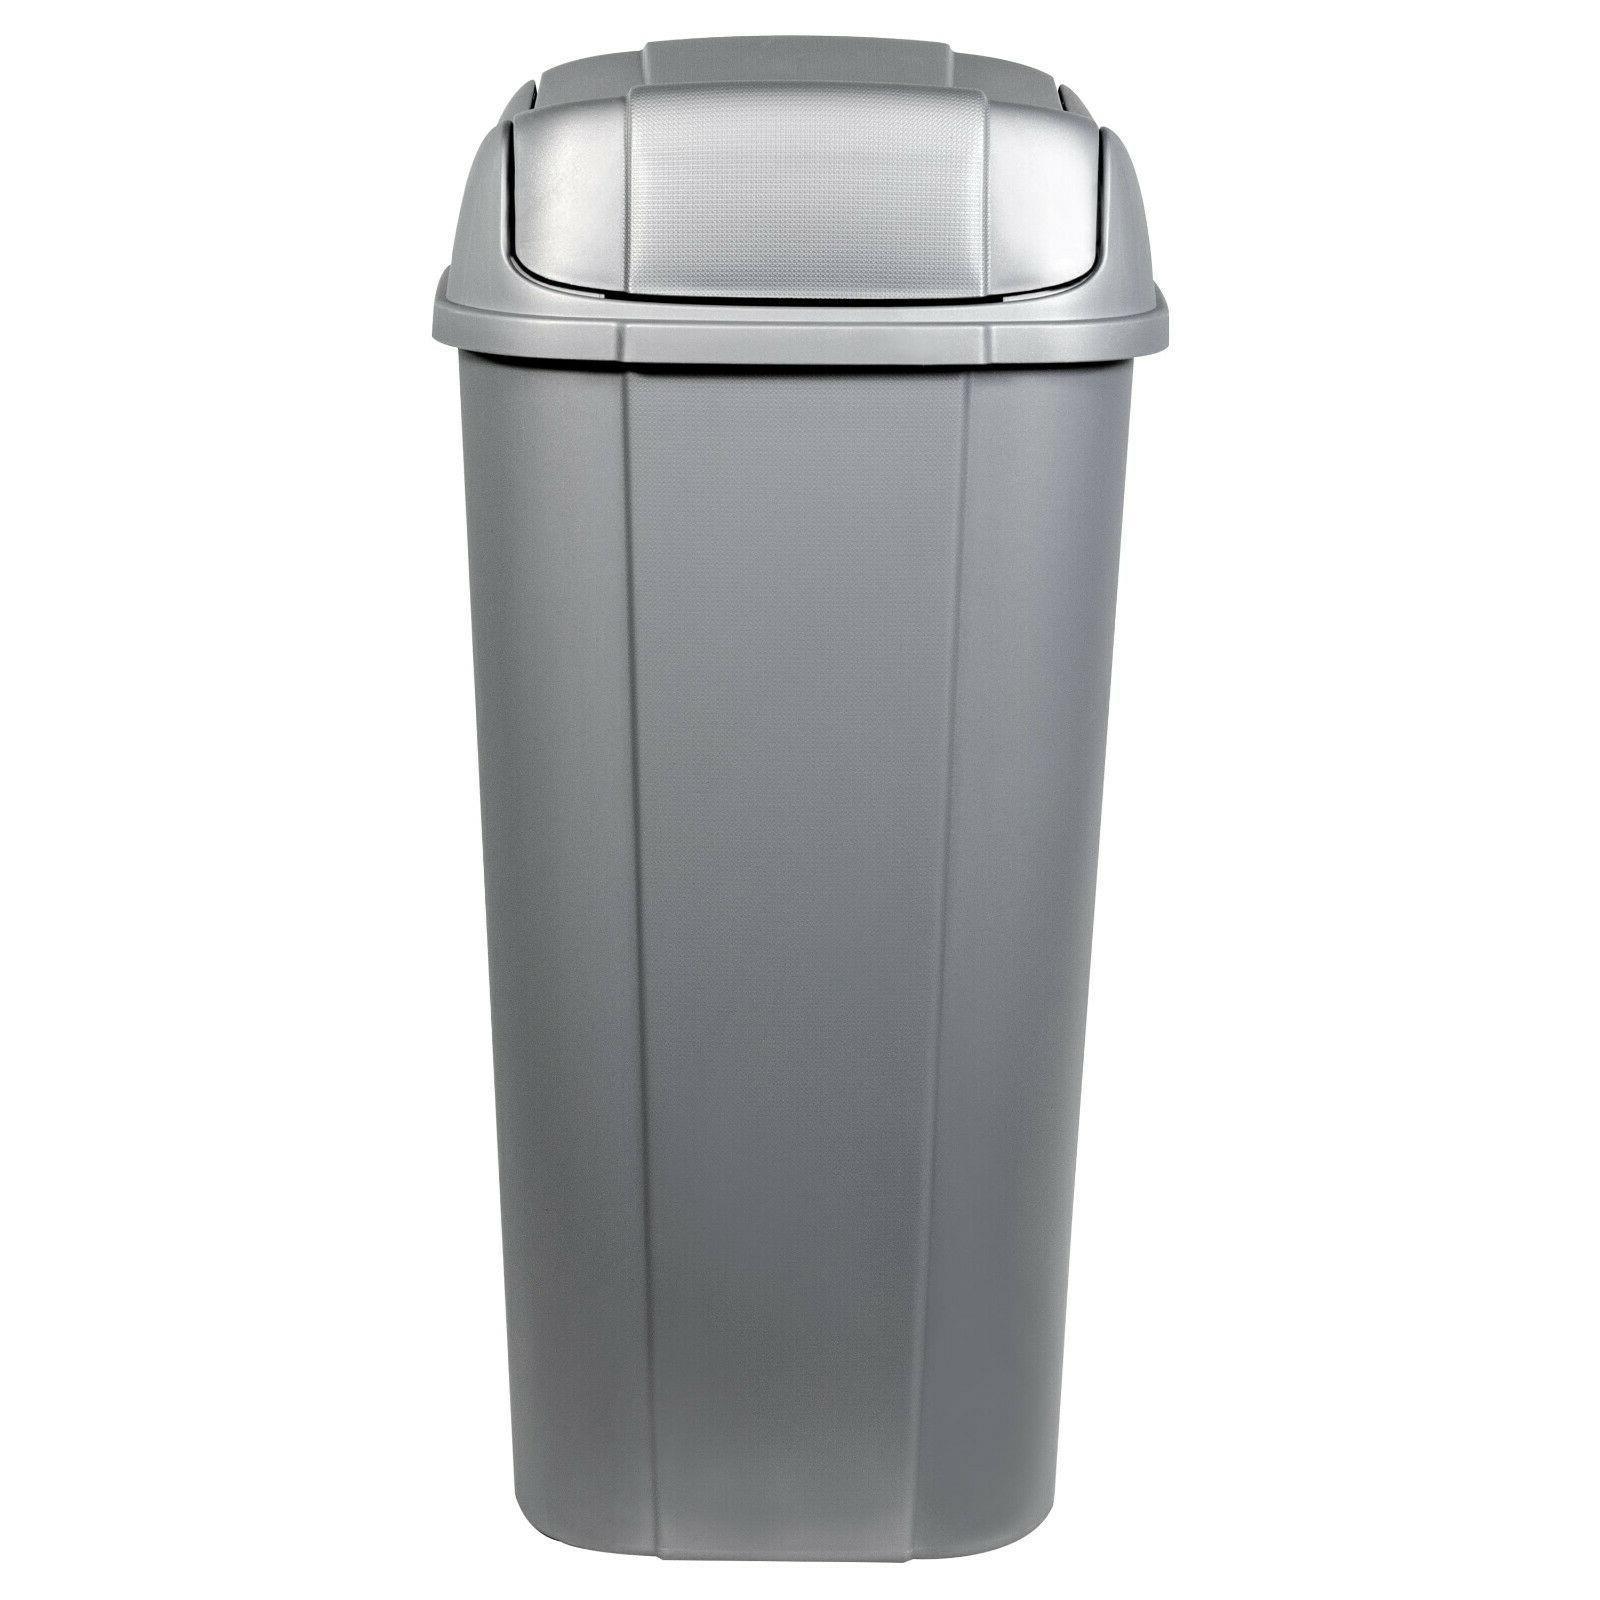 13.3-gallon Hefty Pivot Lid Trash Silver with Decorative Texture